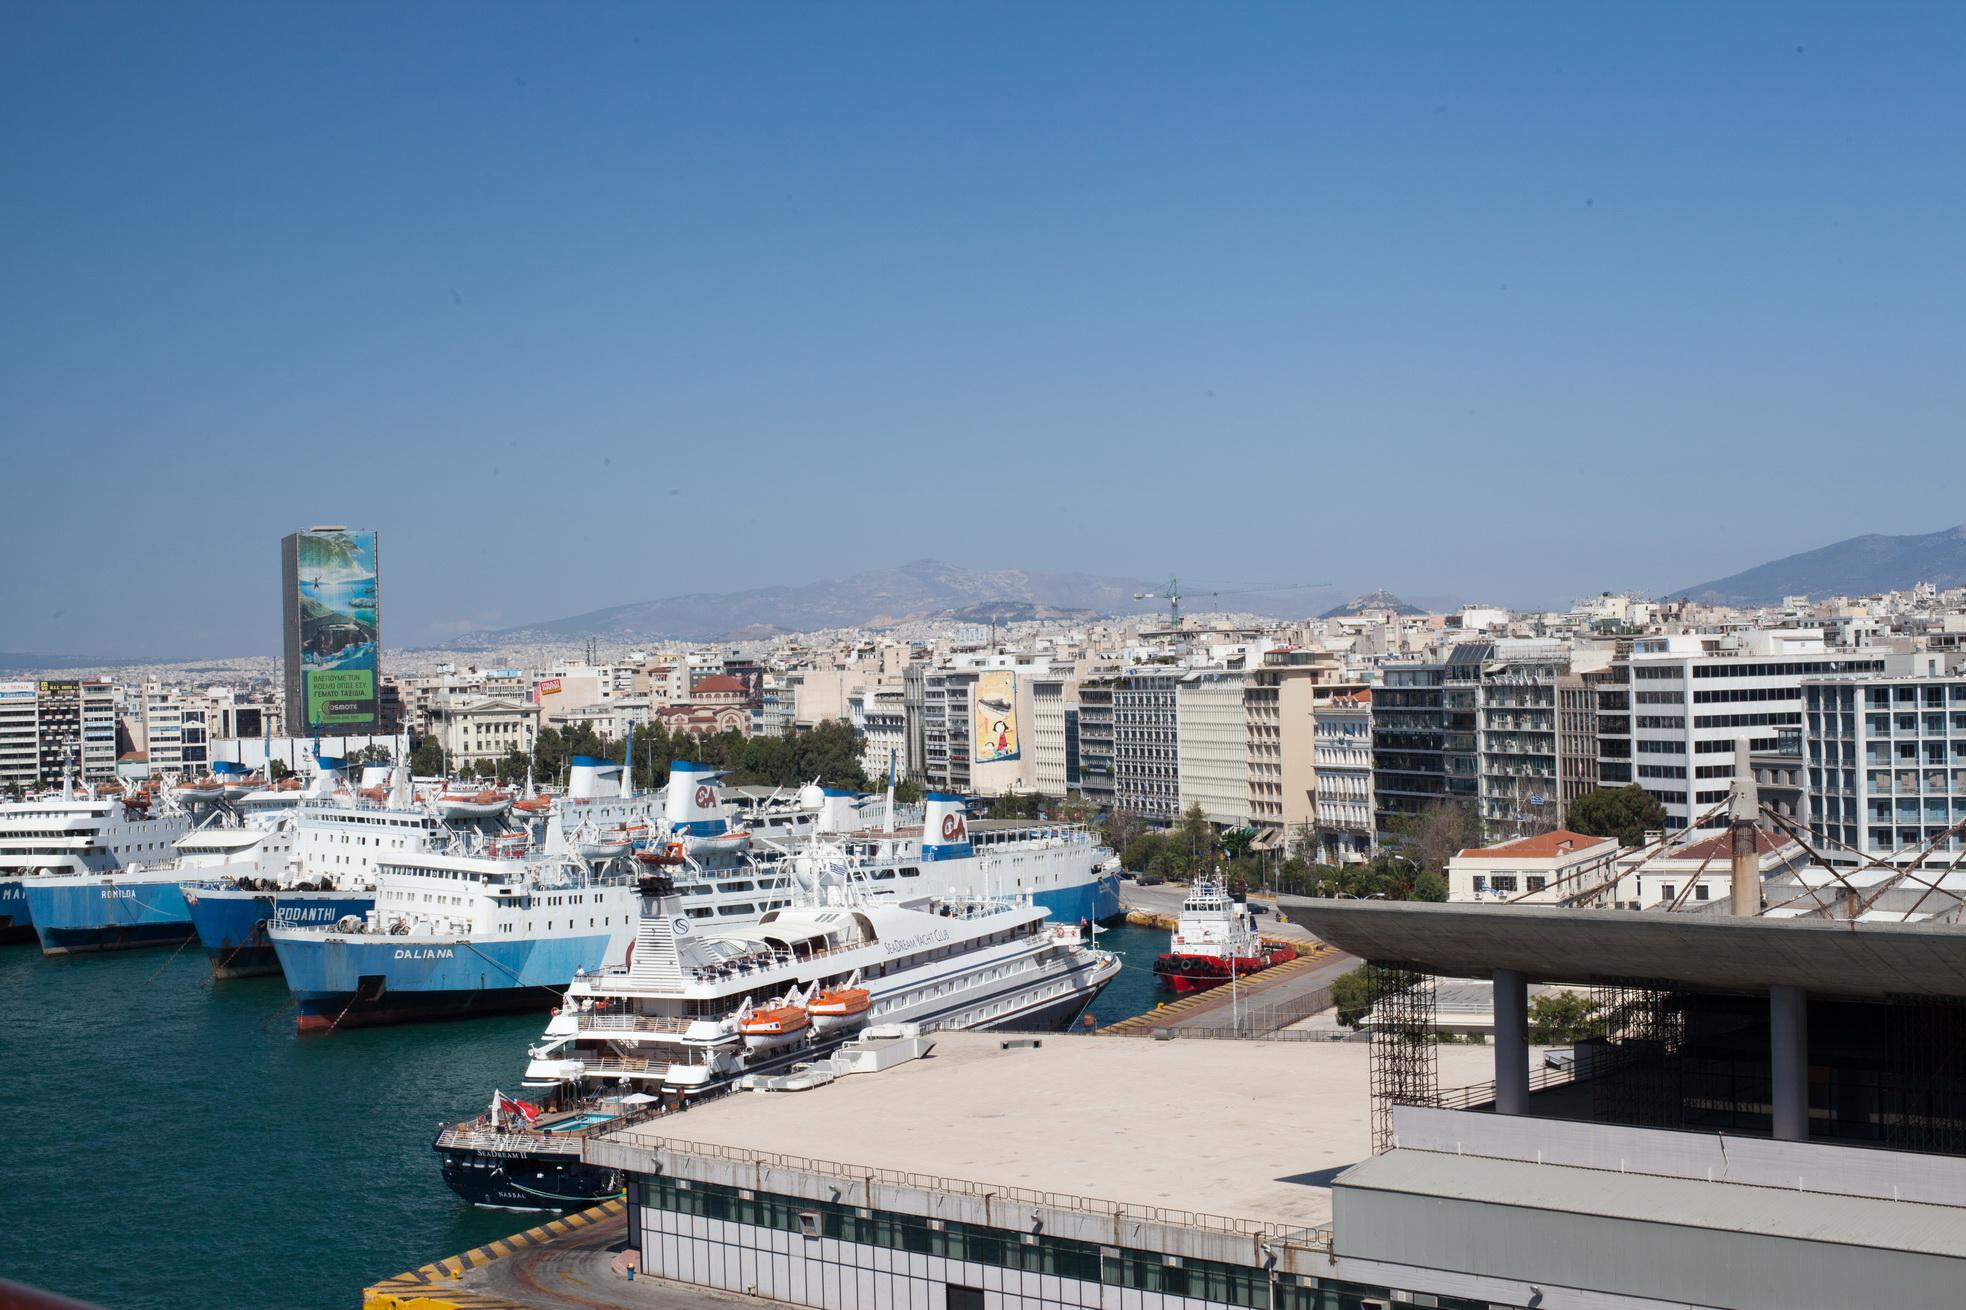 MS Marina Romilda Rodanthi Daliana GA Ferries and Yacht Sea Dream II docked Piraeus Port of Athens Greece 01